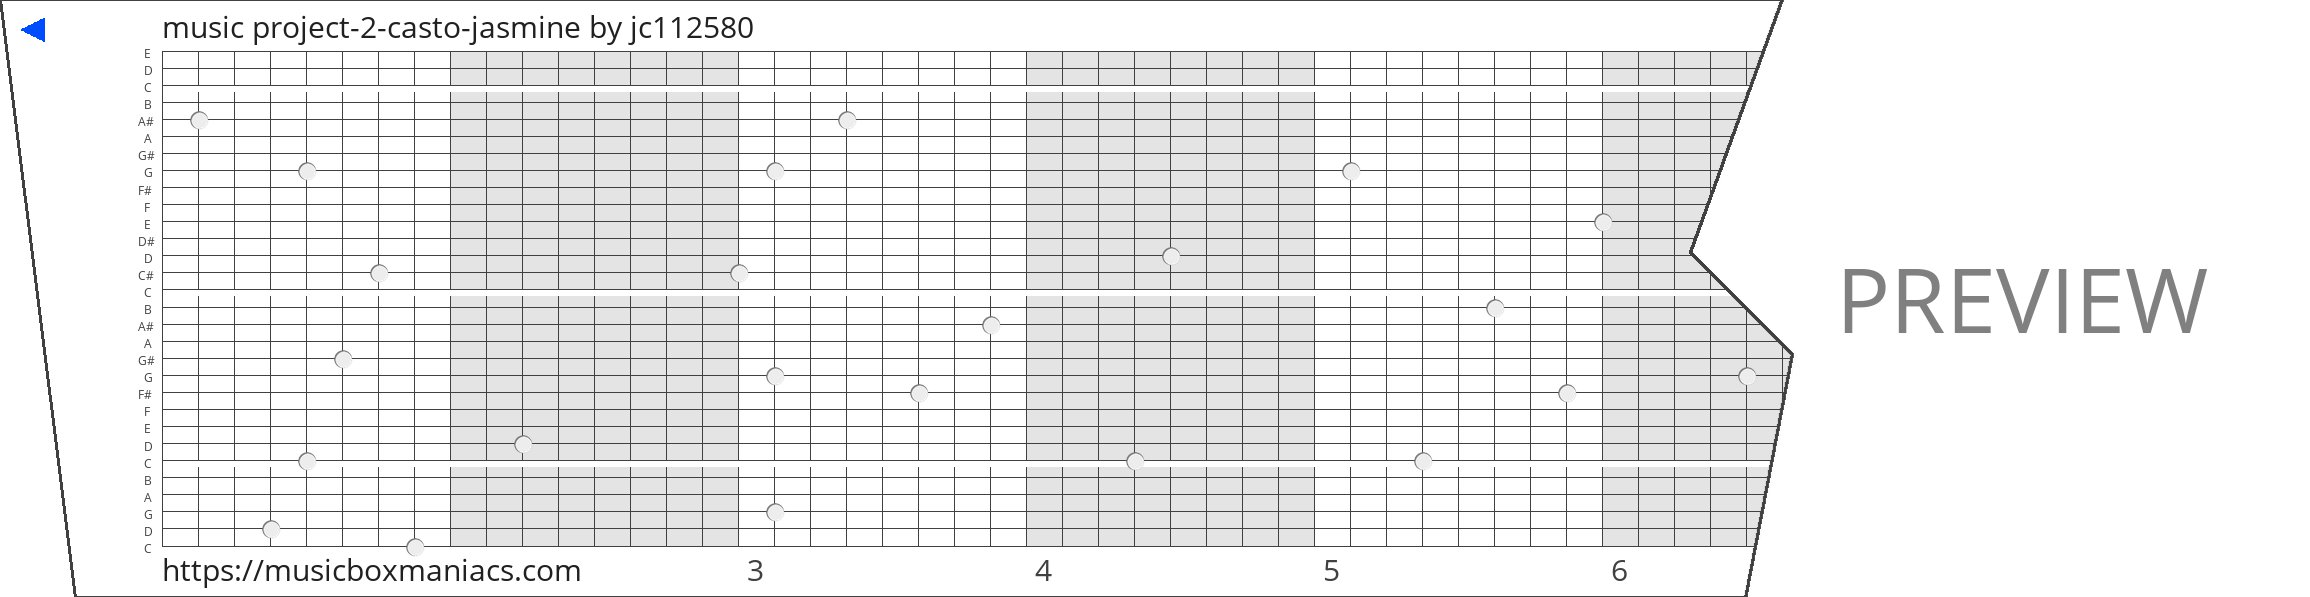 music project-2-casto-jasmine 30 note music box paper strip